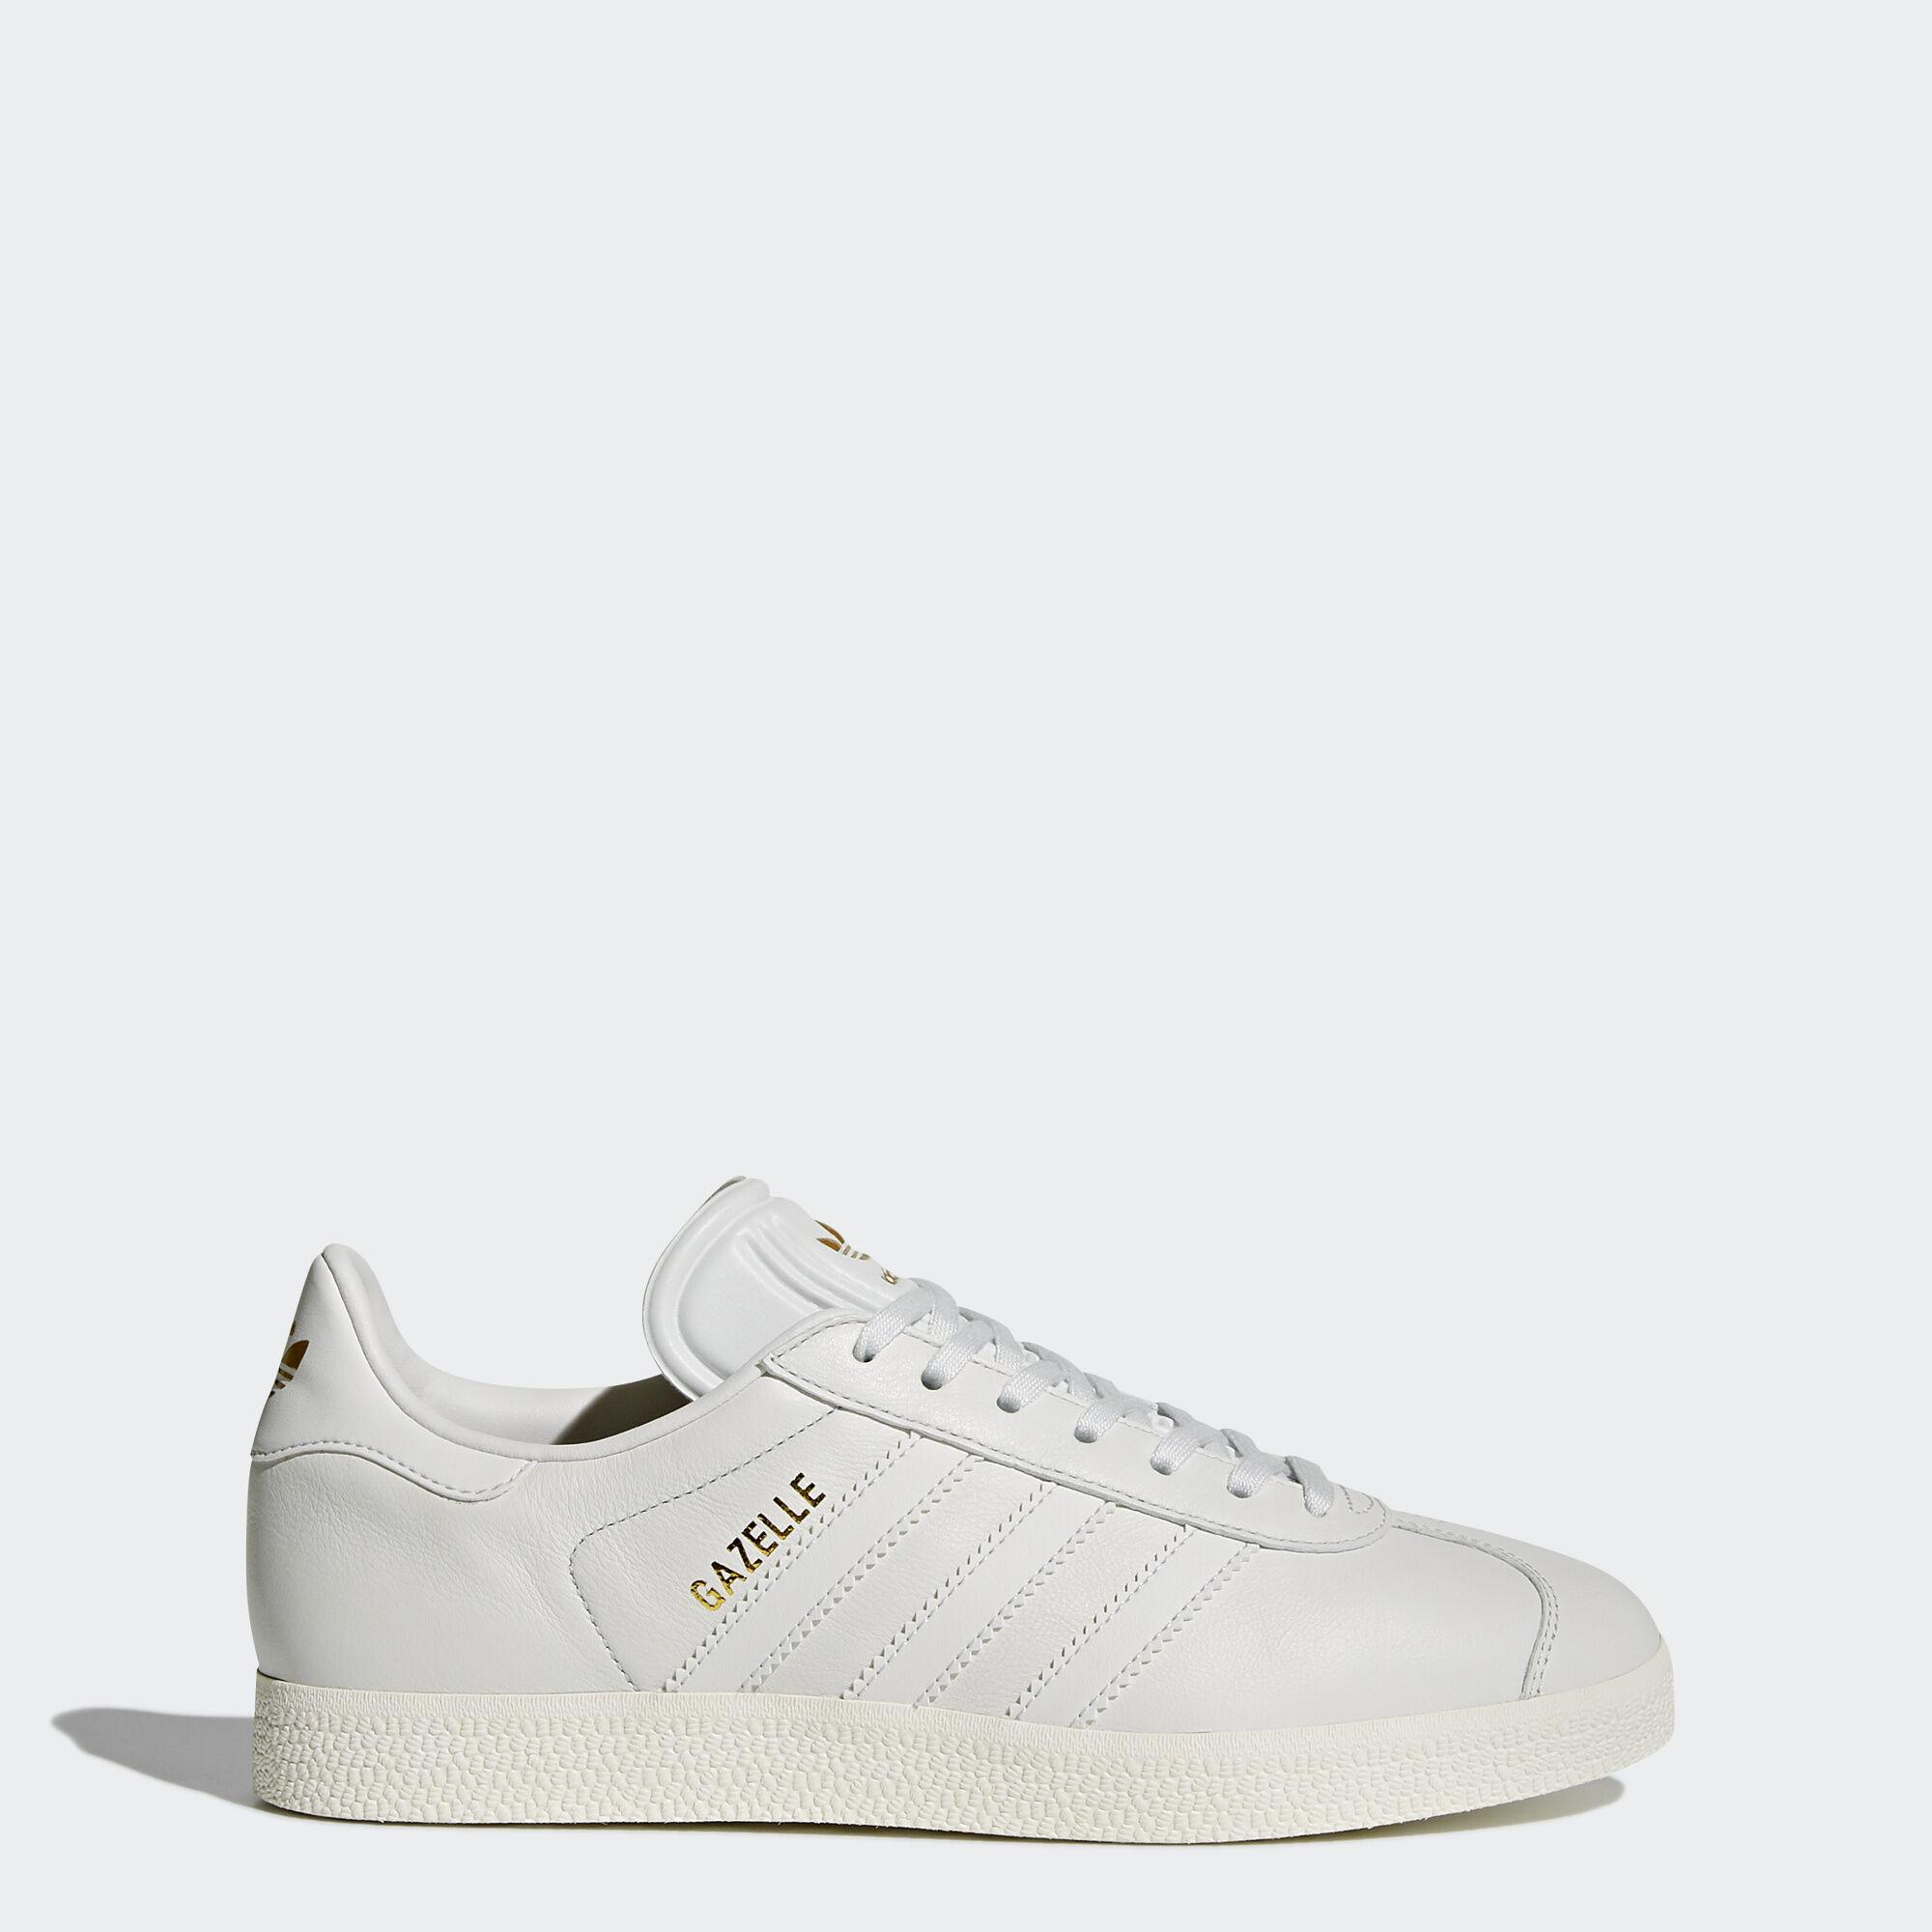 adidas - Gazelle Shoes Crystal White/Crystal White/Gold Metallic BY9354